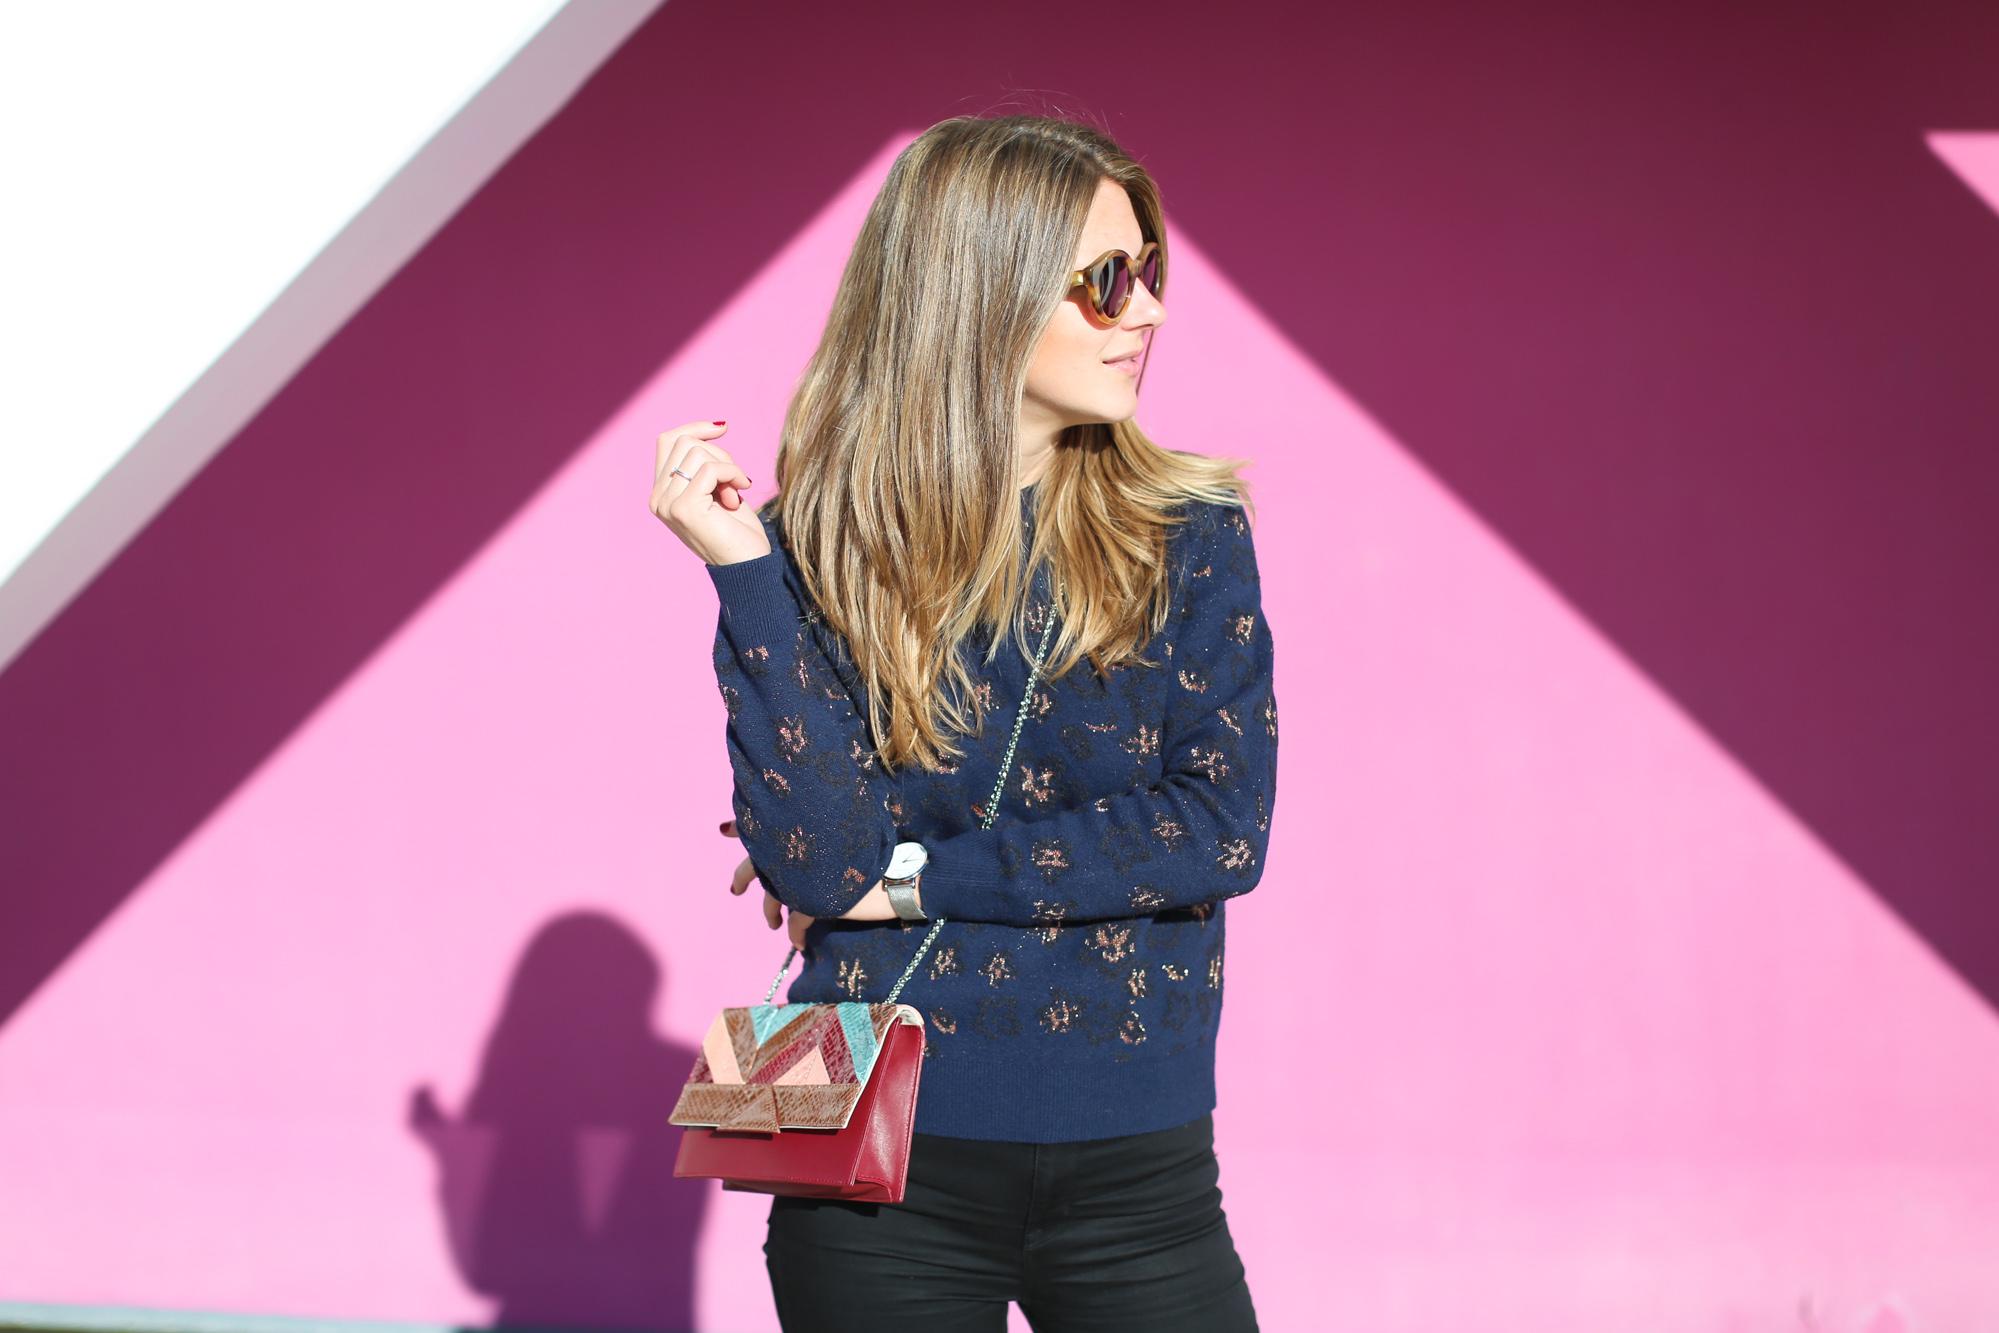 Clochet_fashionblogger_streetstyle_&otherstories_stilettoankleboots_burgundyheroscarf_metallicflowerssweater_titamadridspiga-6